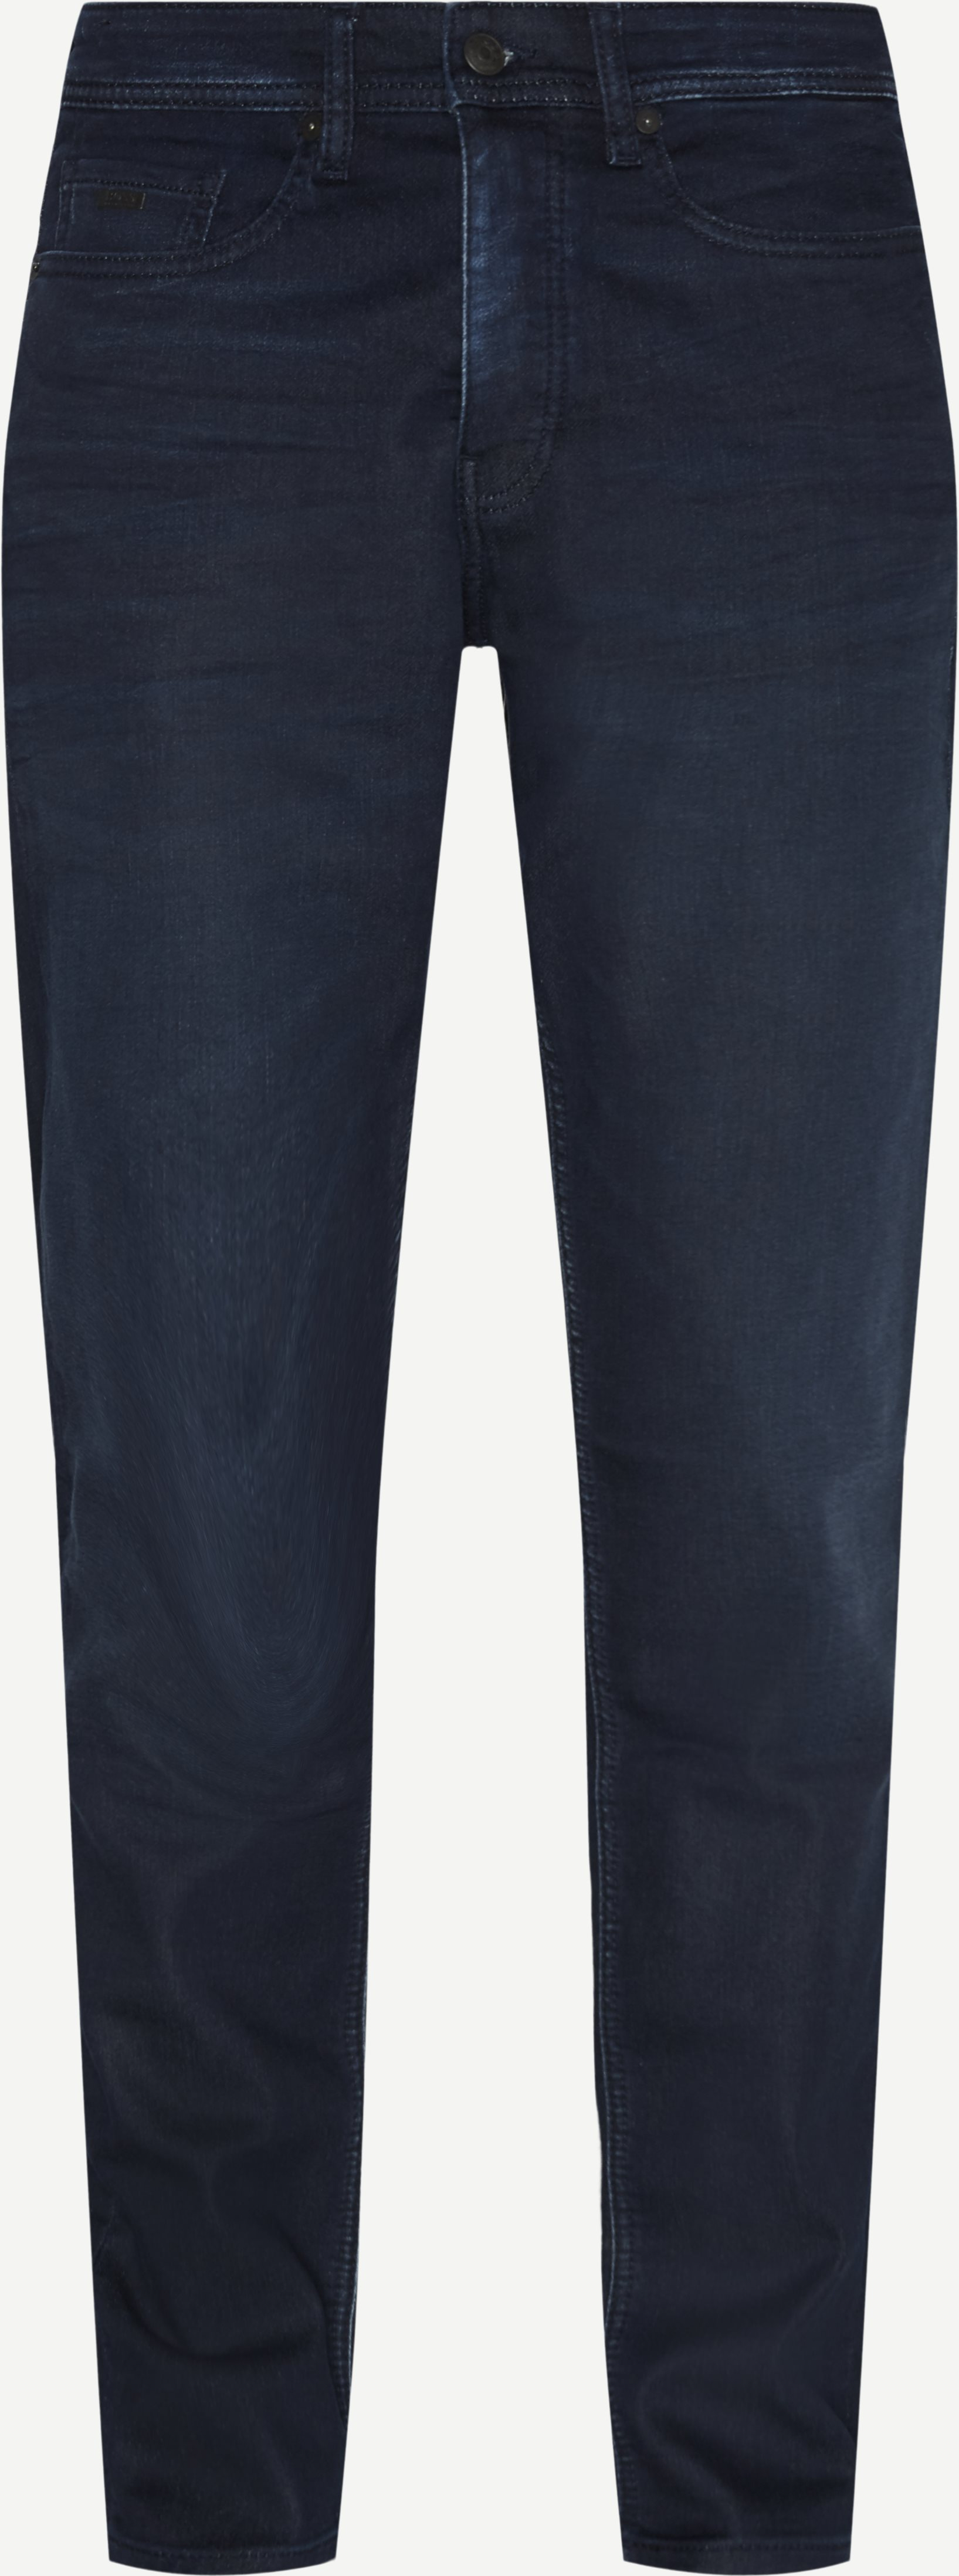 Jeans - Tapered fit - Denim